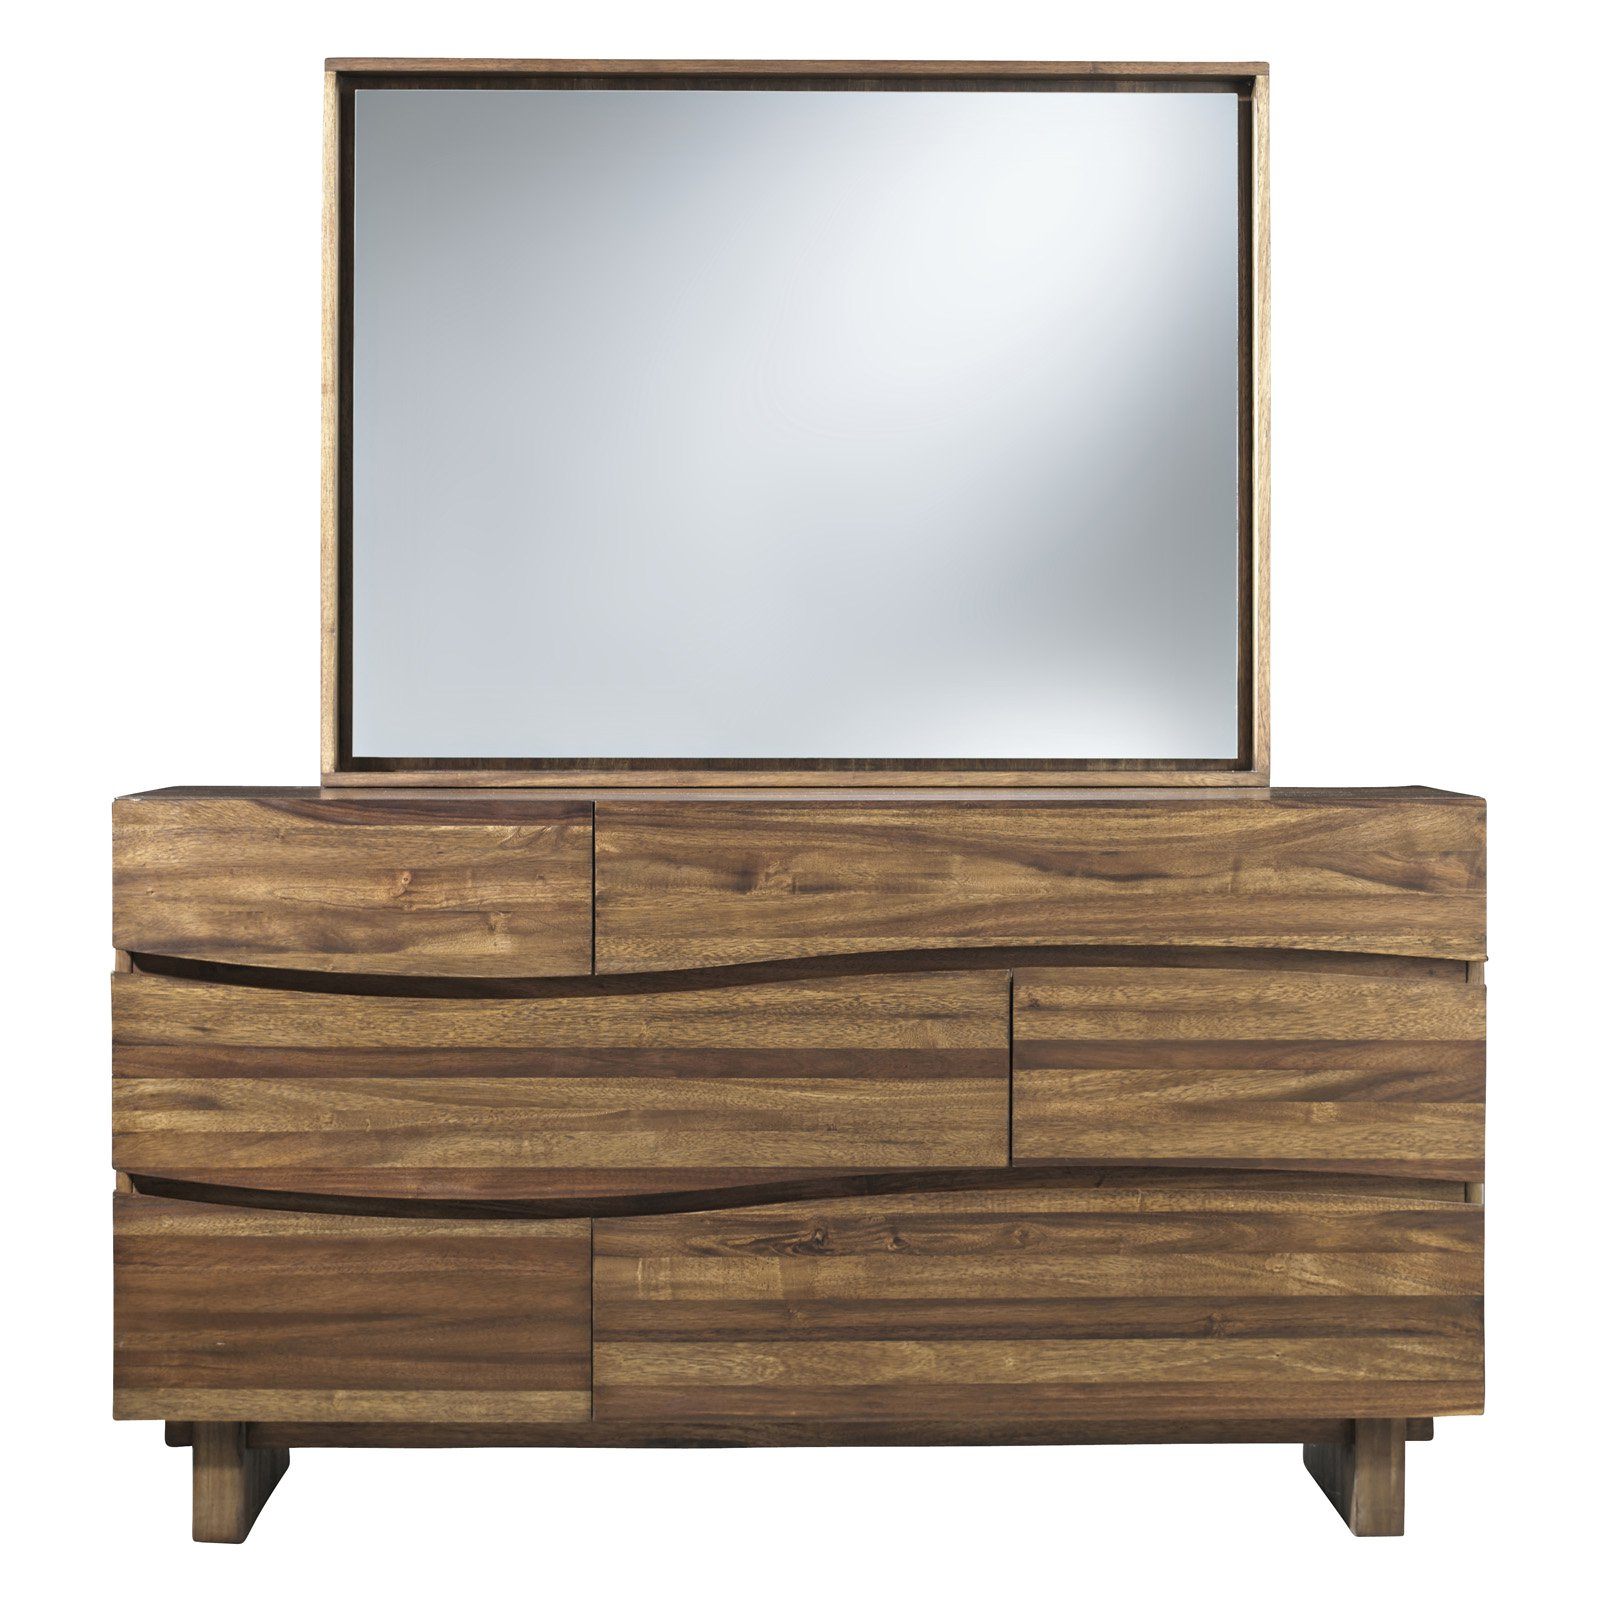 Modus Ocean 6-Drawer Dresser with Optional Mirror